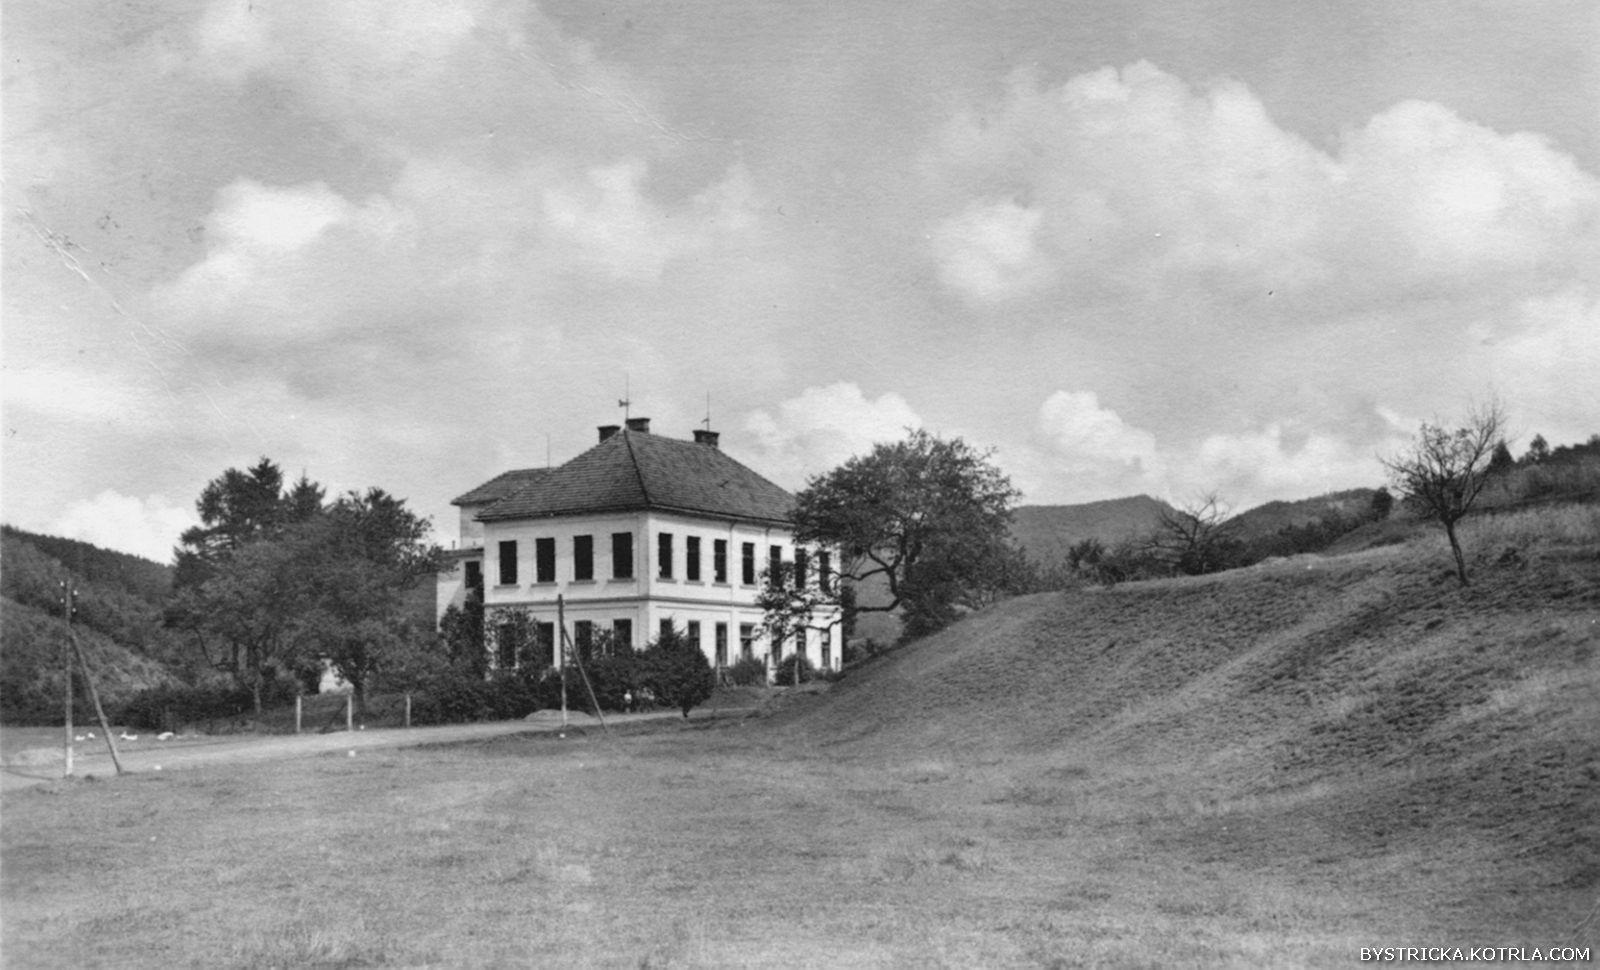 Škola v šedesátých letech